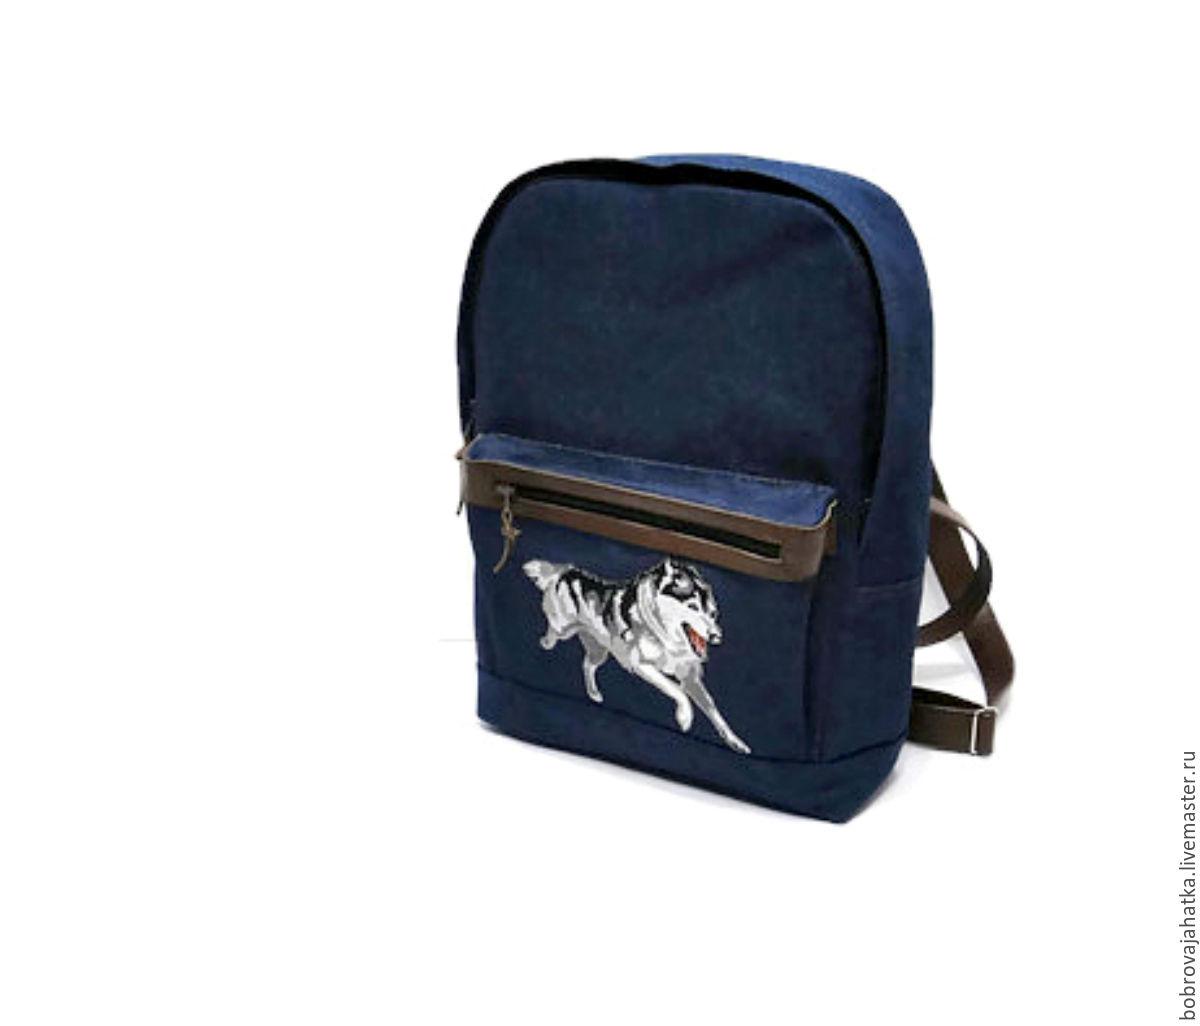 Рюкзак студенту дэвид джонс рюкзаки каталог